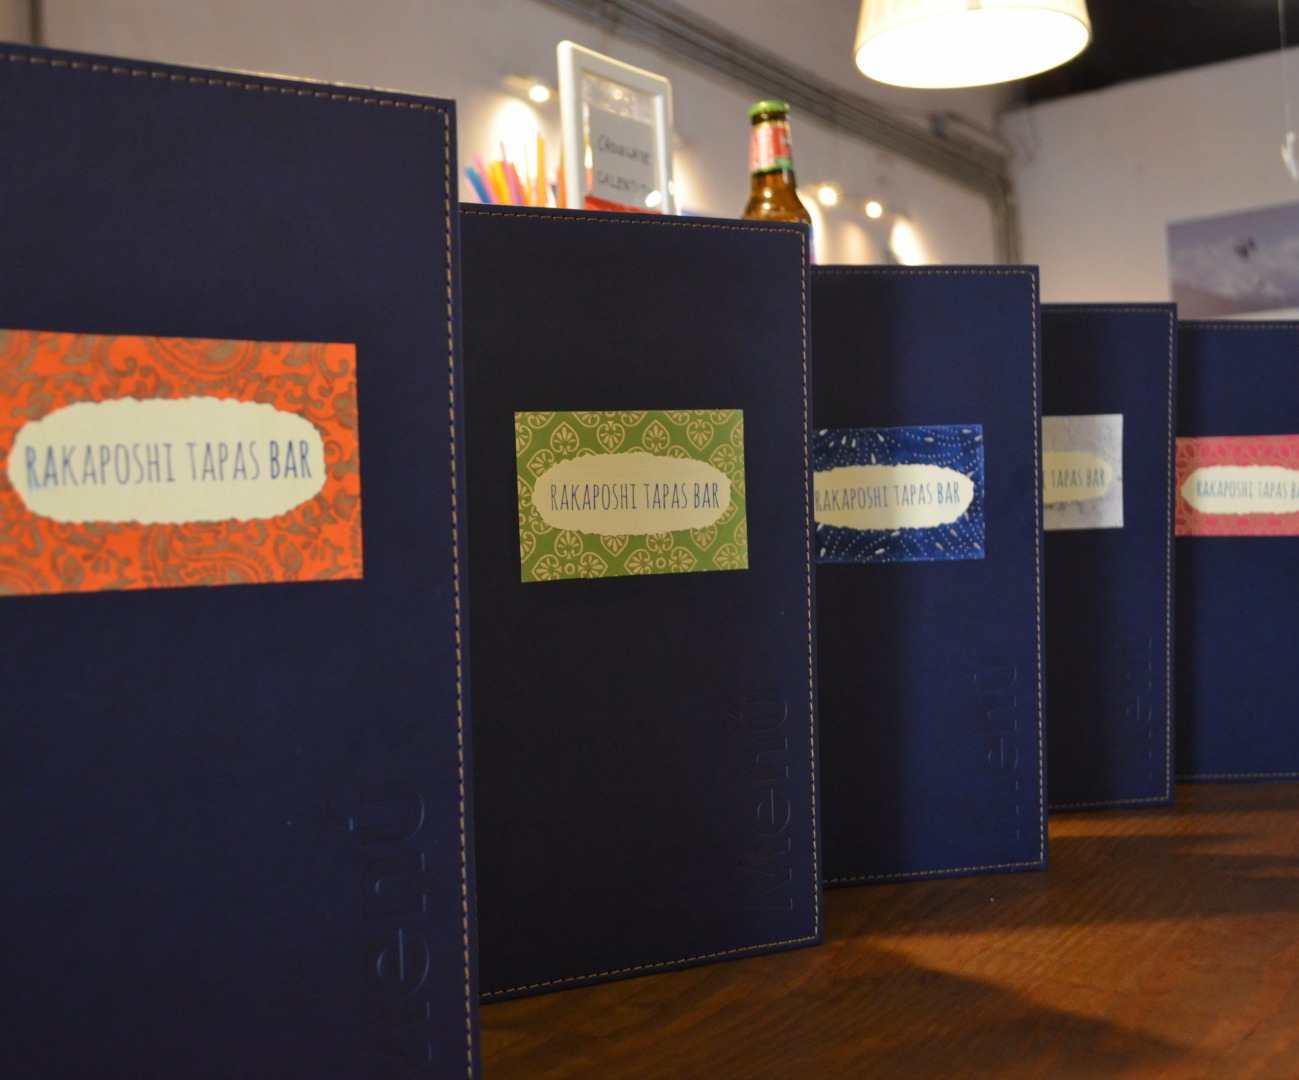 Carta nueva en Rakaposhi Tapas Bar